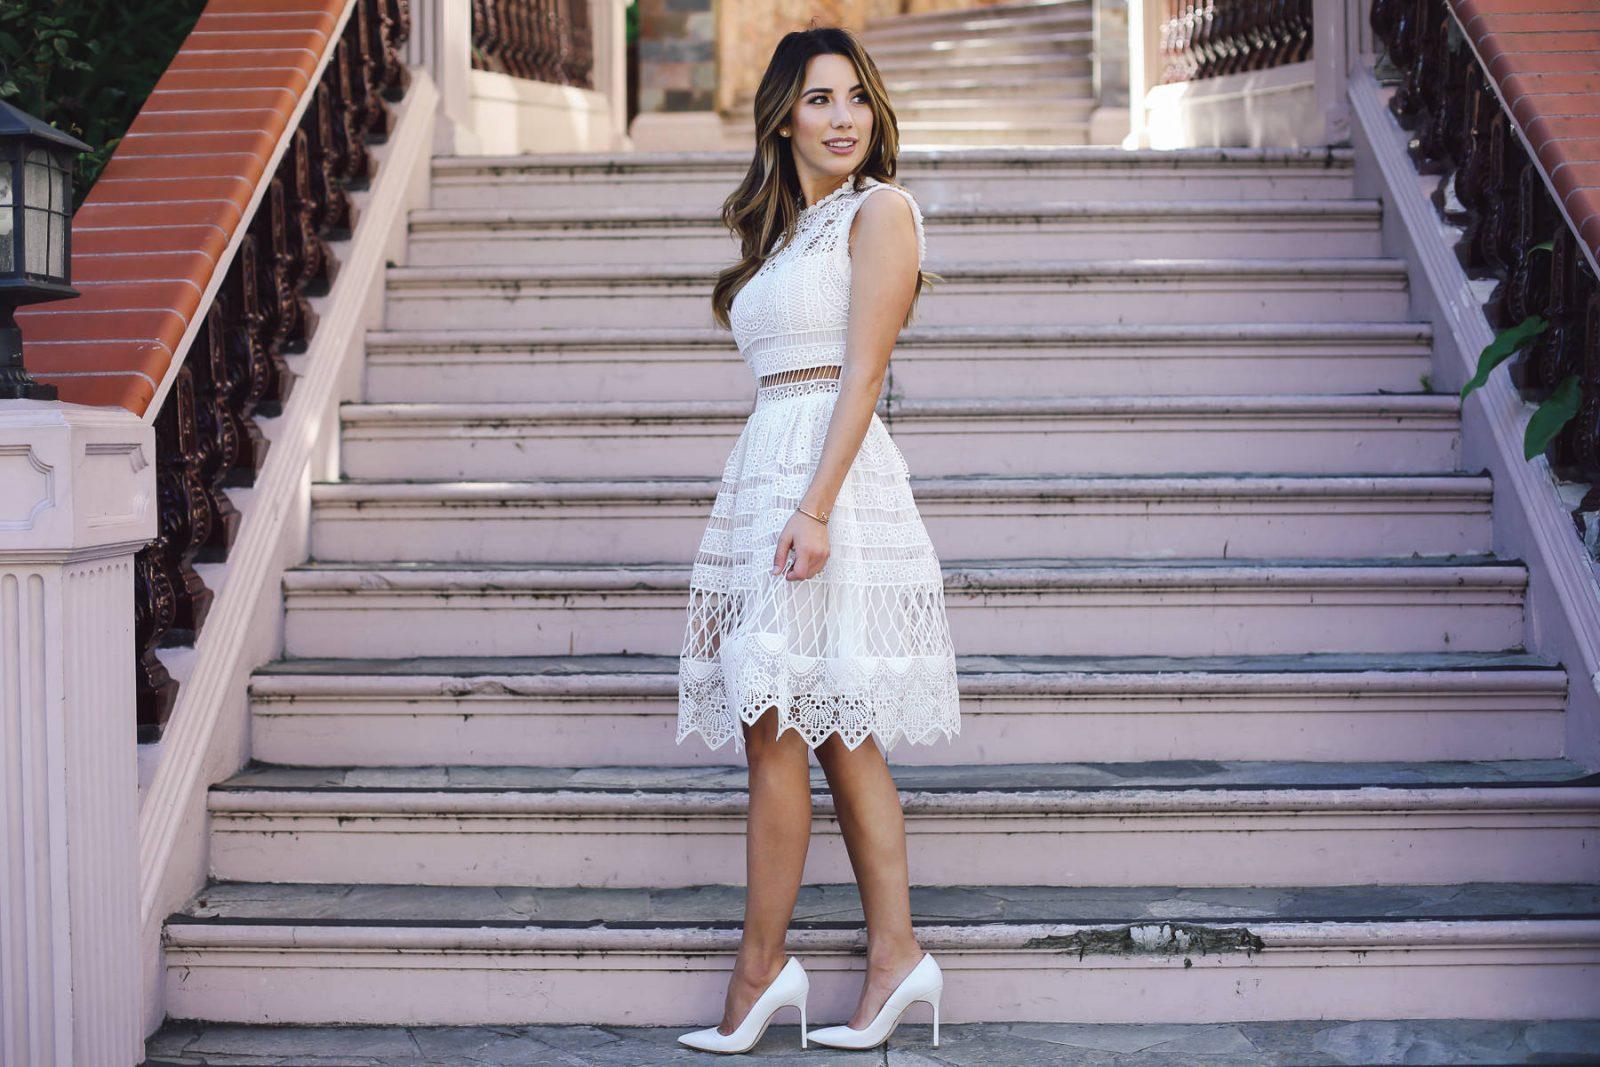 Ariana-Lauren-Fashionborn-White-Laced-Skater-Dress-Fashion-Blogger-Photography-by-Ryan-Chua-8817